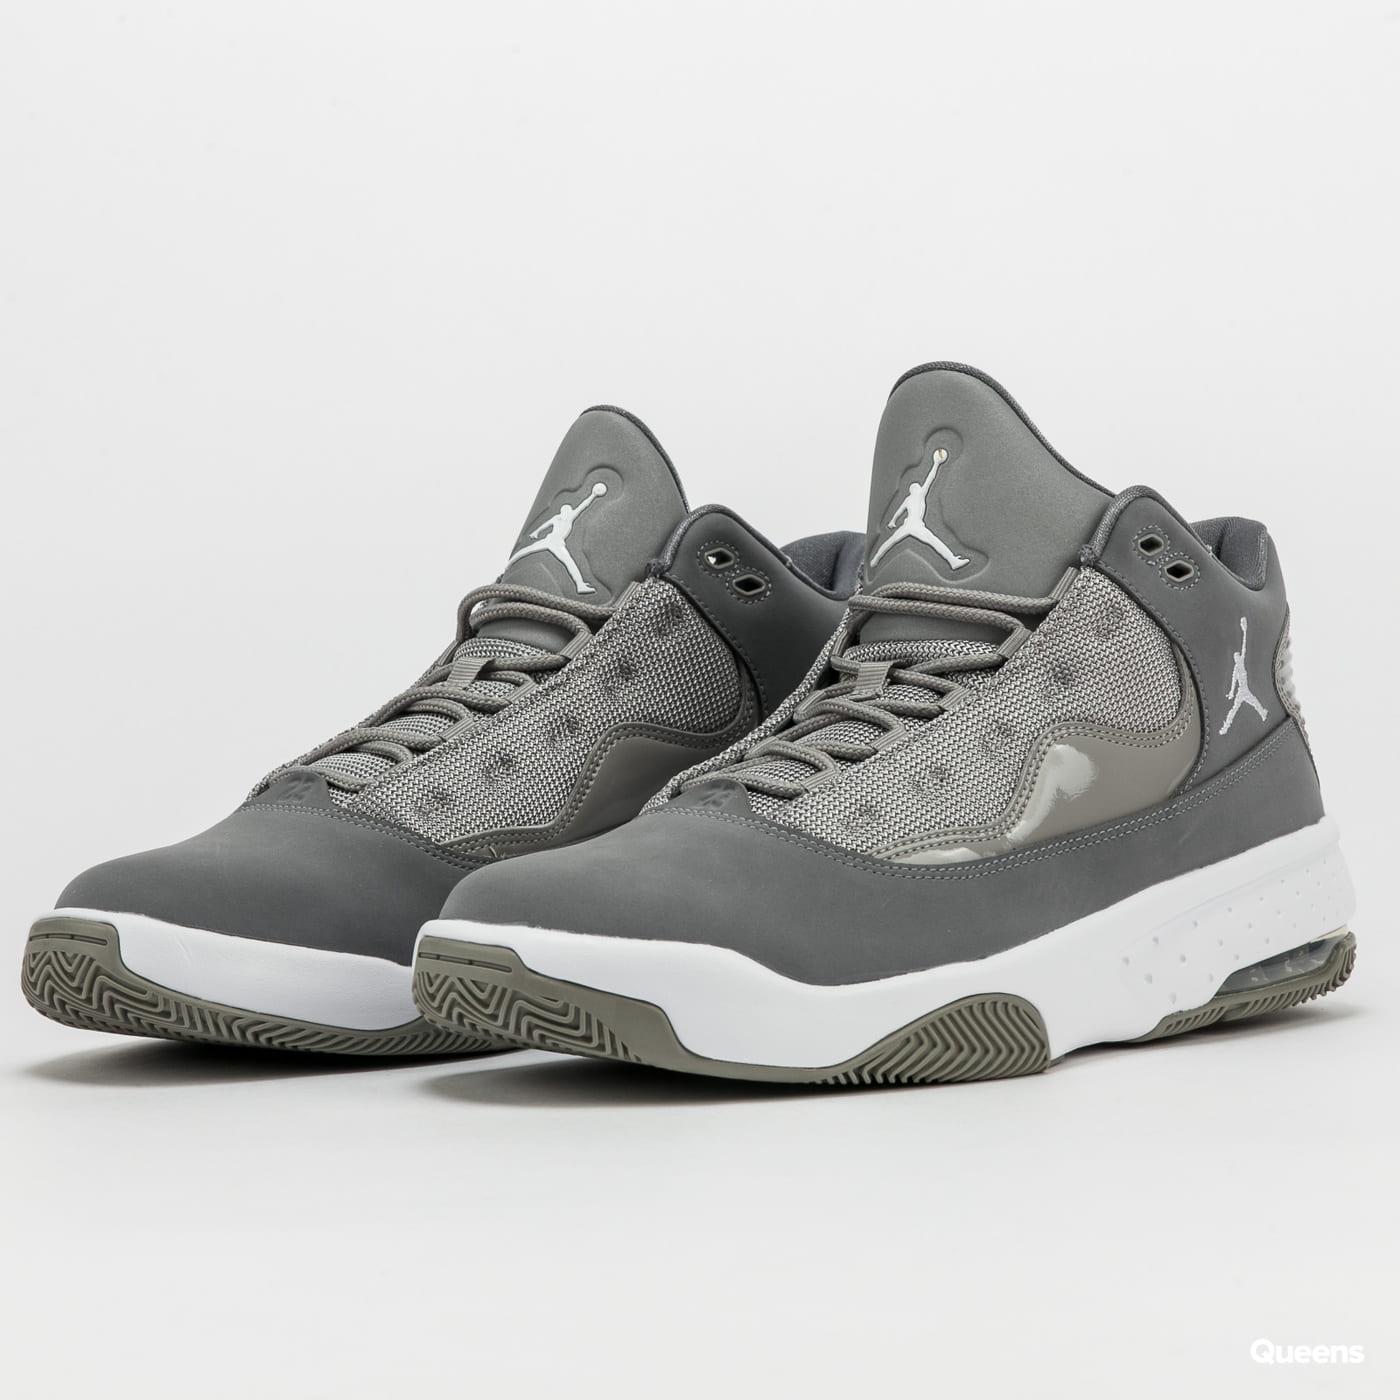 Jordan Max Aura 2 medium grey / white - cool grey